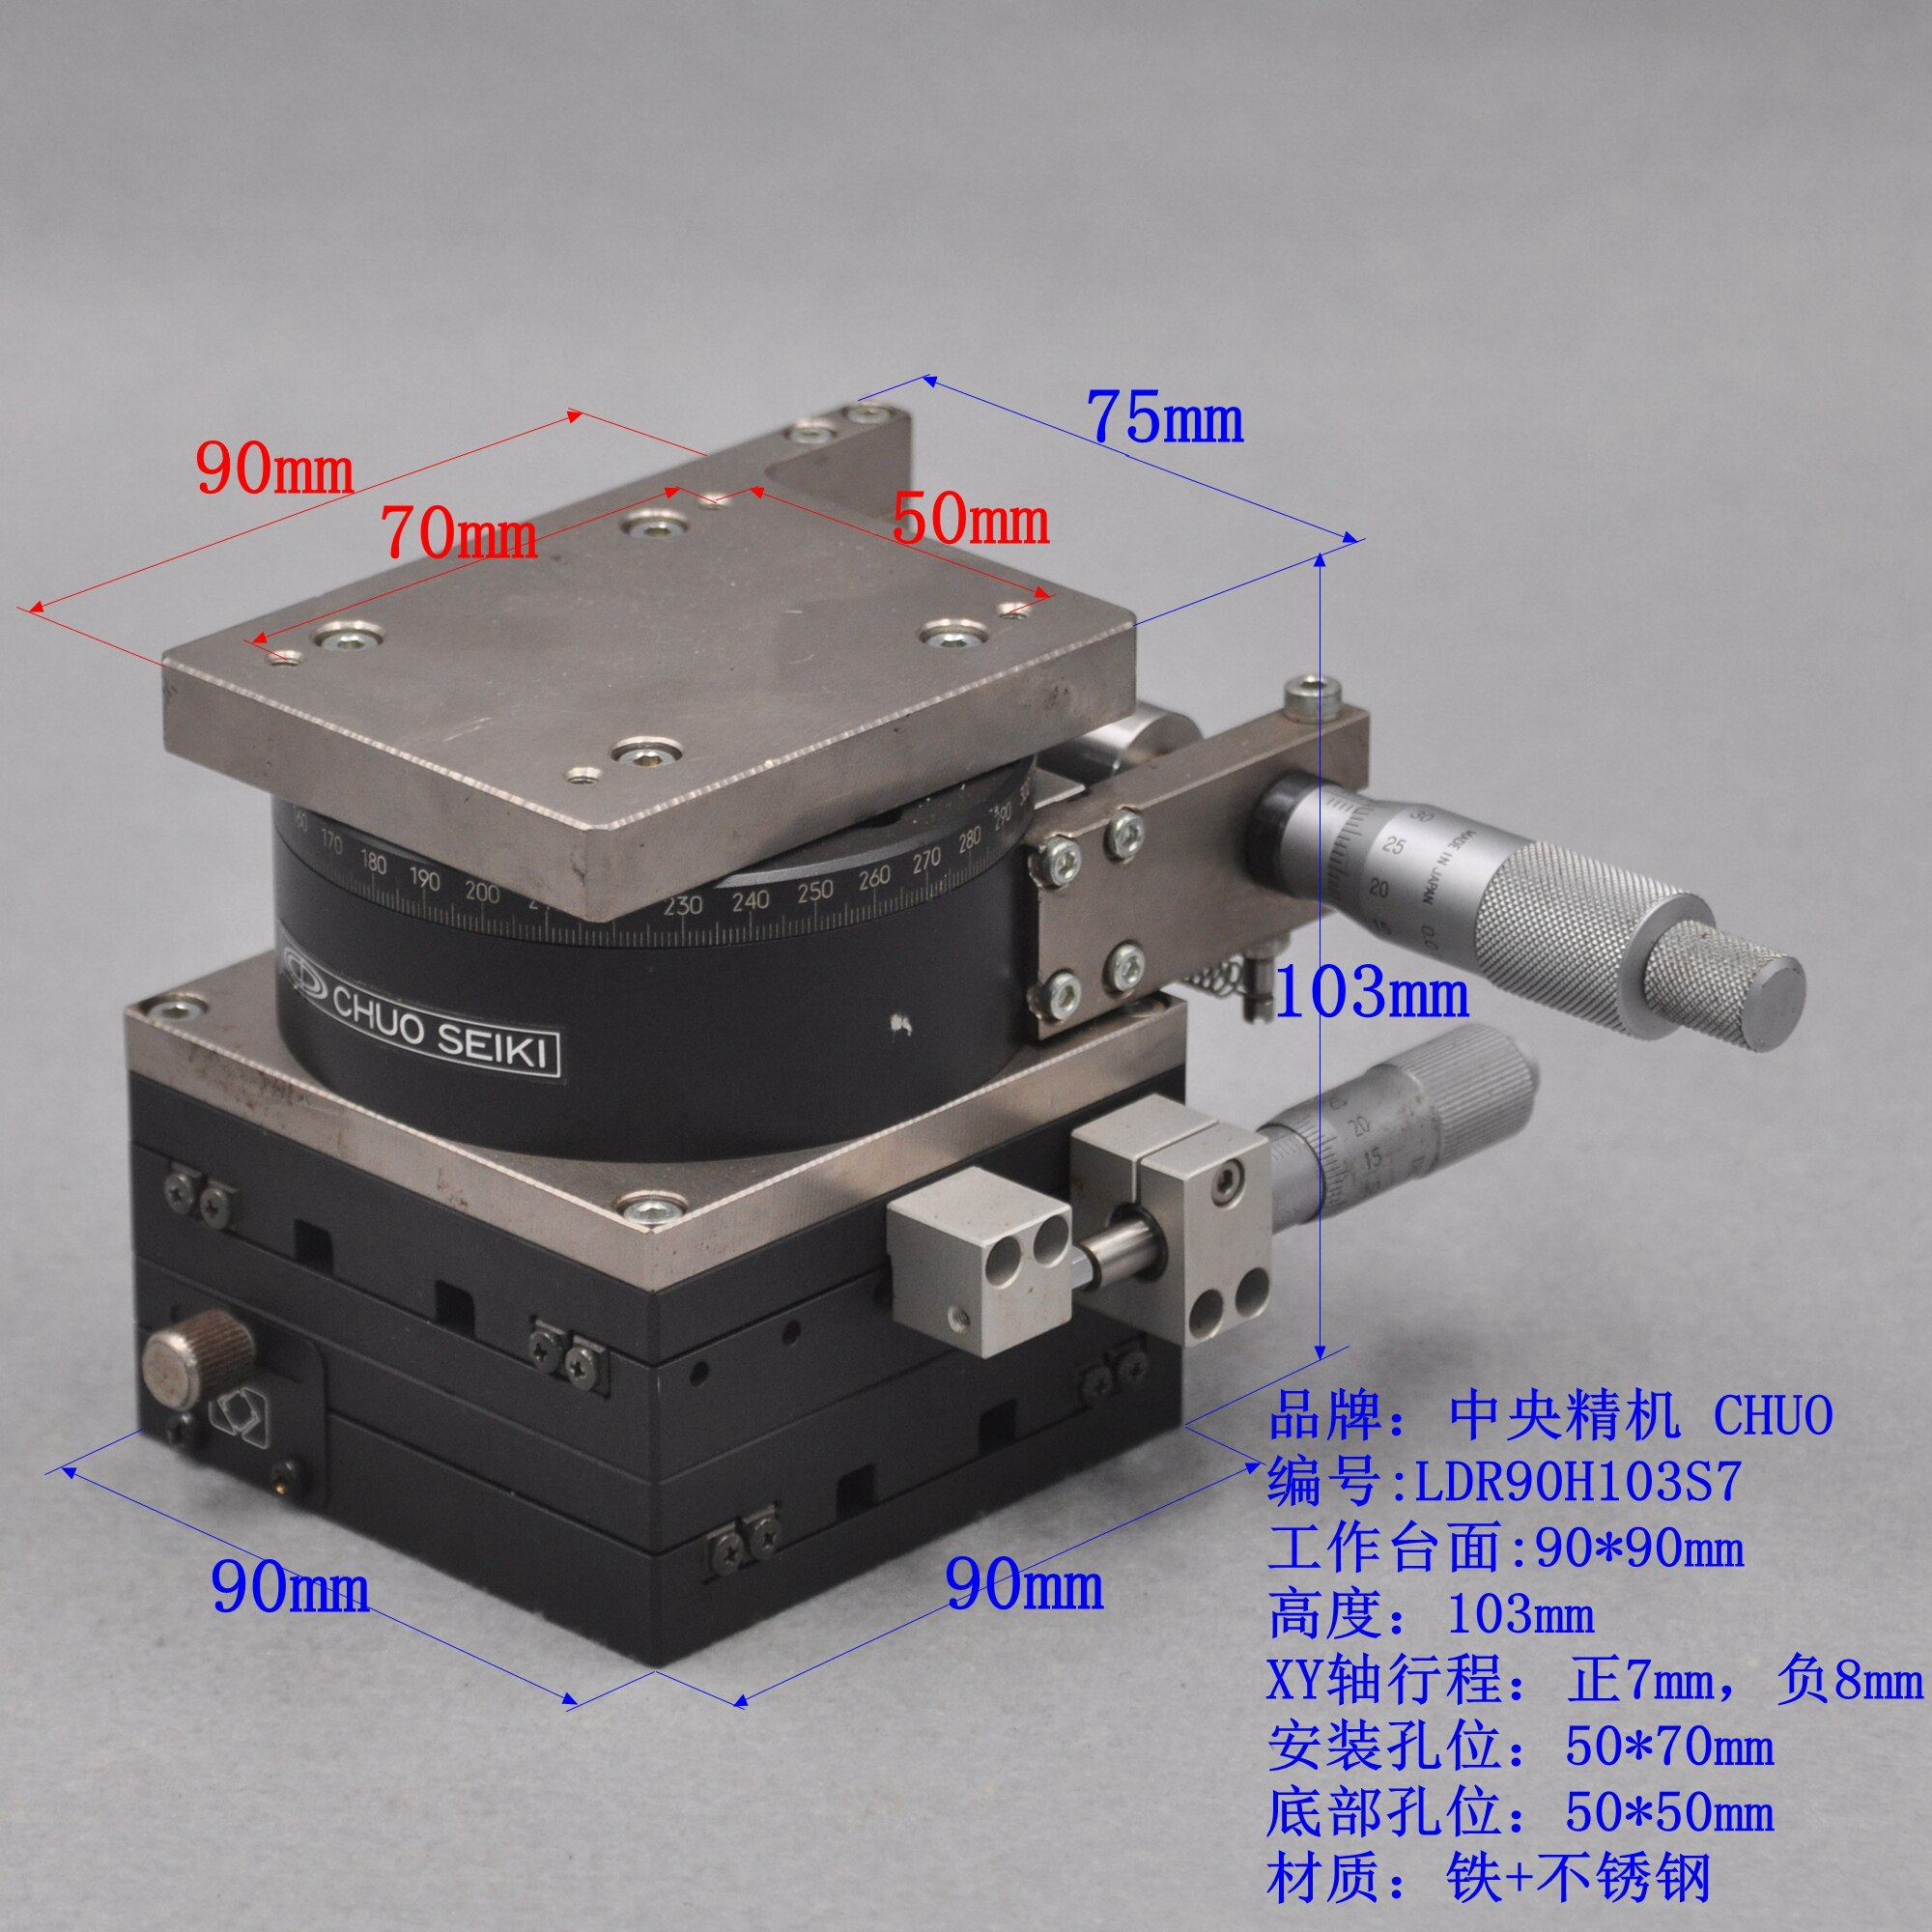 CHUO SEIKI XYR axis 3D manual optical cross rail rotary platform fine adjustment slide 75 * 90mm enlarge